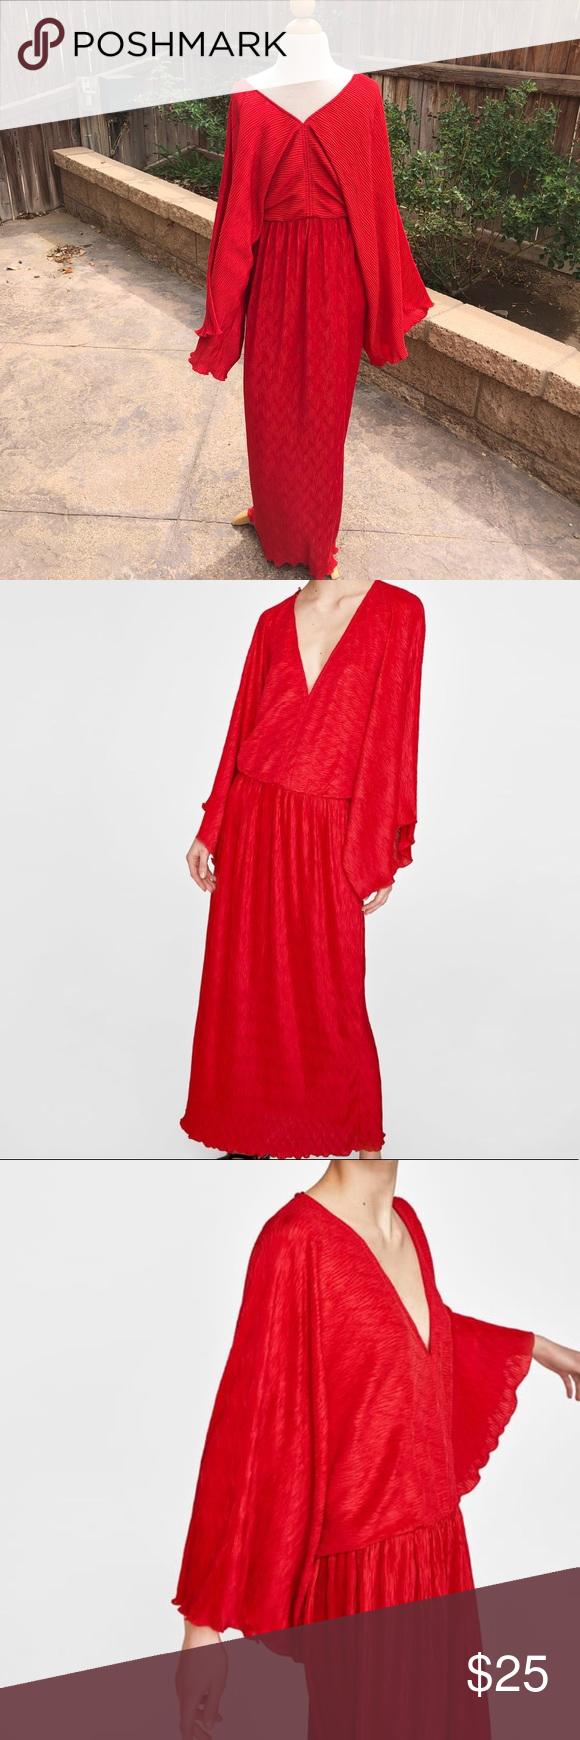 Nwot zara red kimono inspired dress pinterest zara dresses